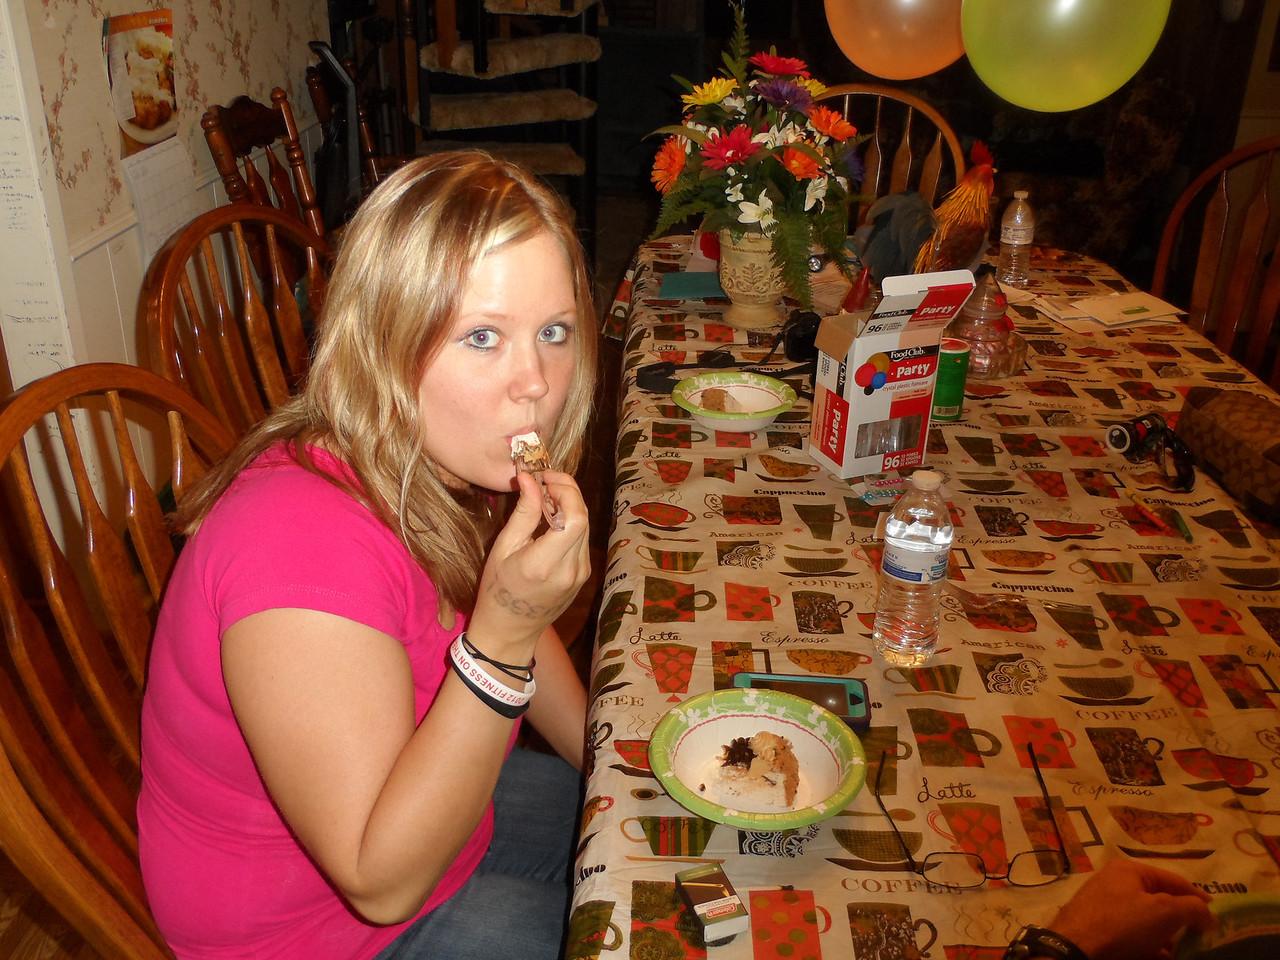 Katie seems to like the ice cream cake also.  Luke's birthday party 2013.